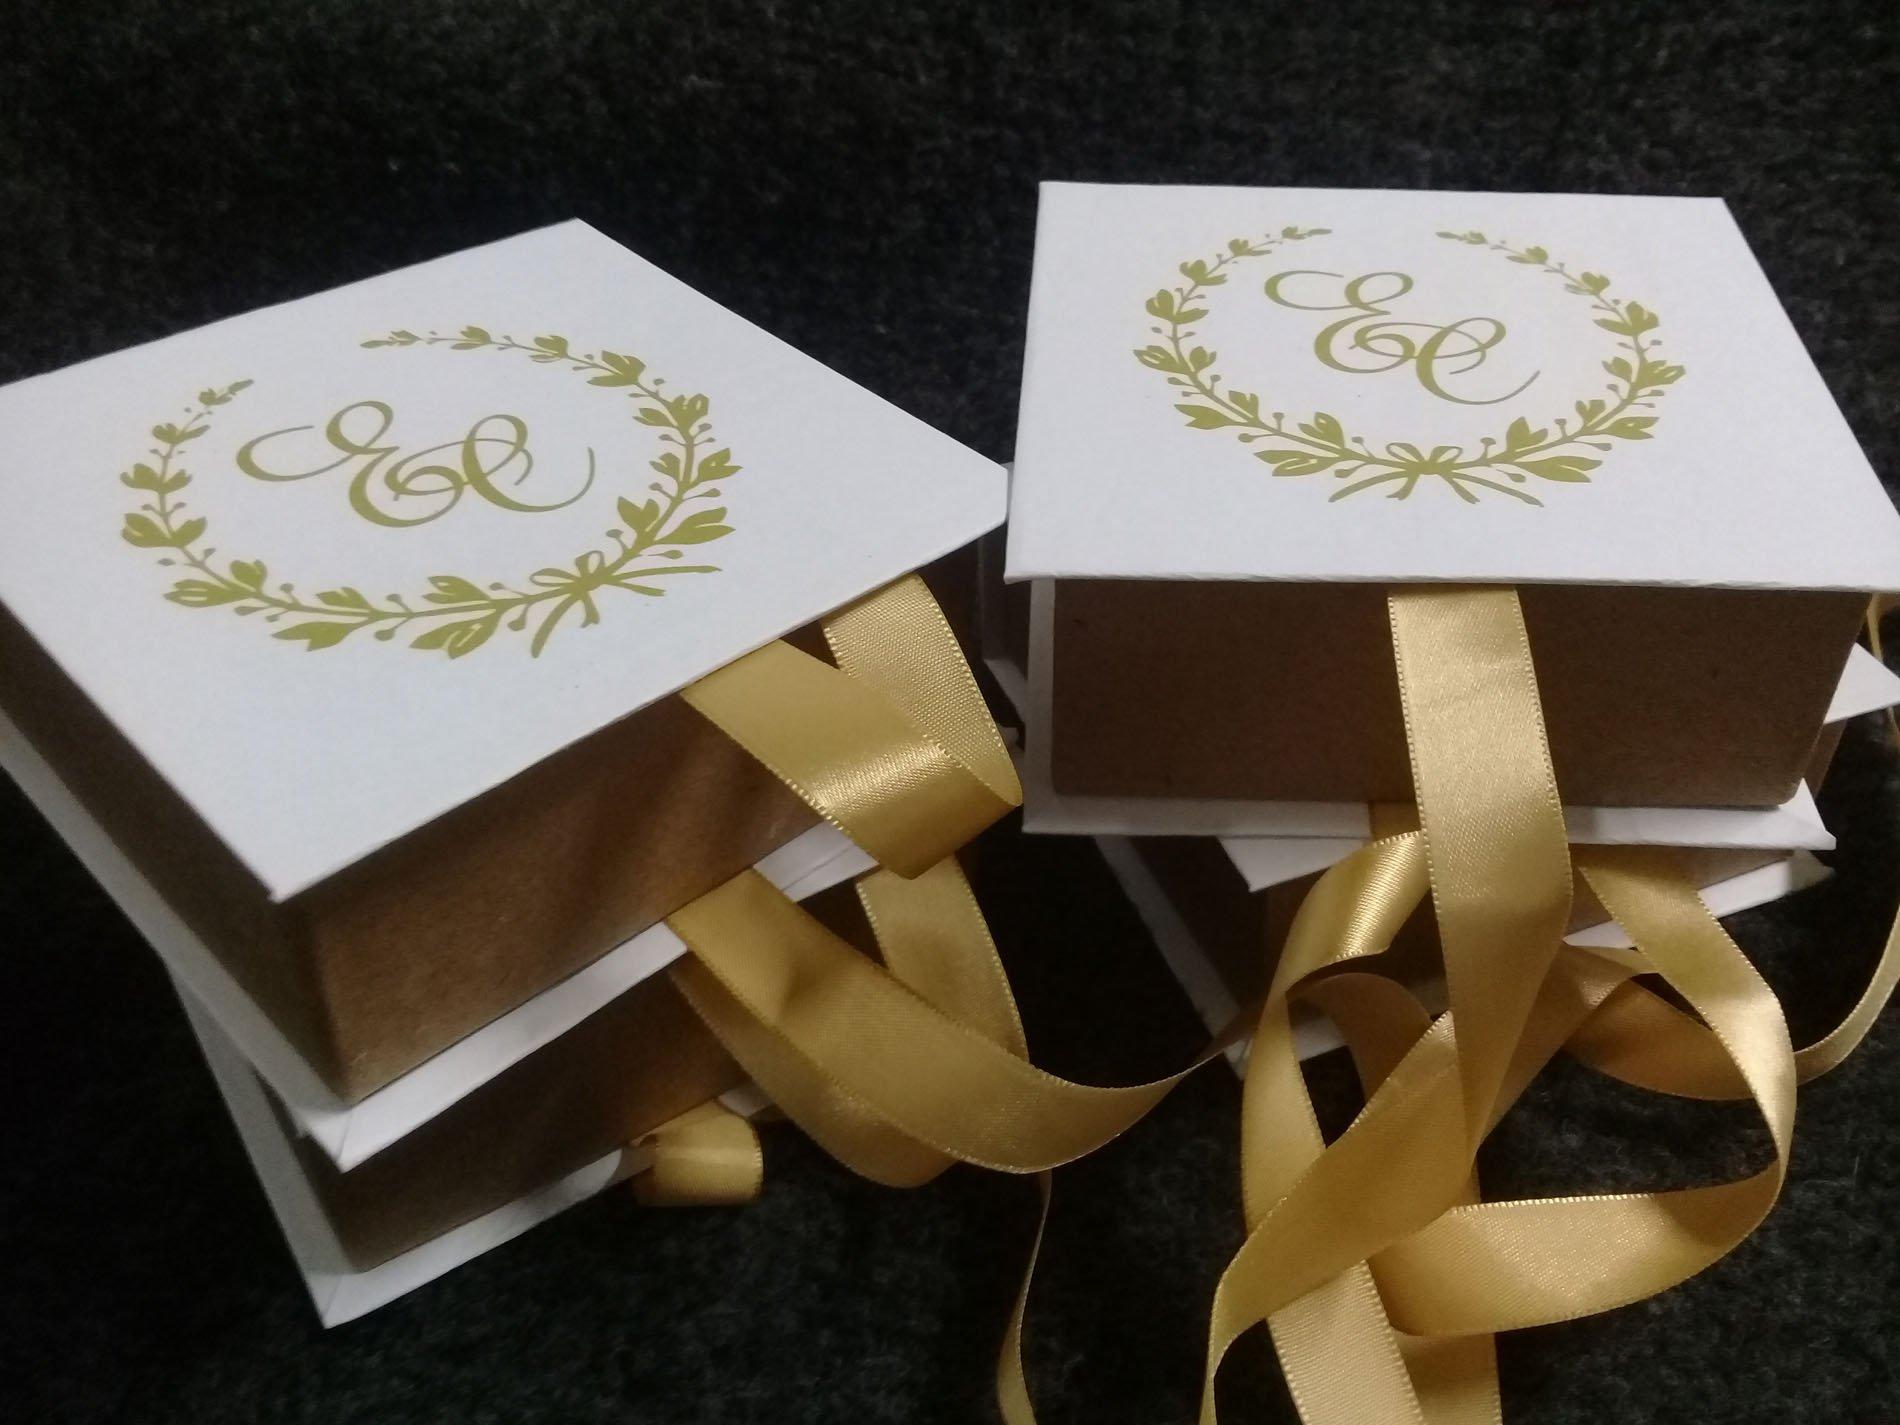 Caixa 10x10 - Ideal  para convites, bombons, doces.